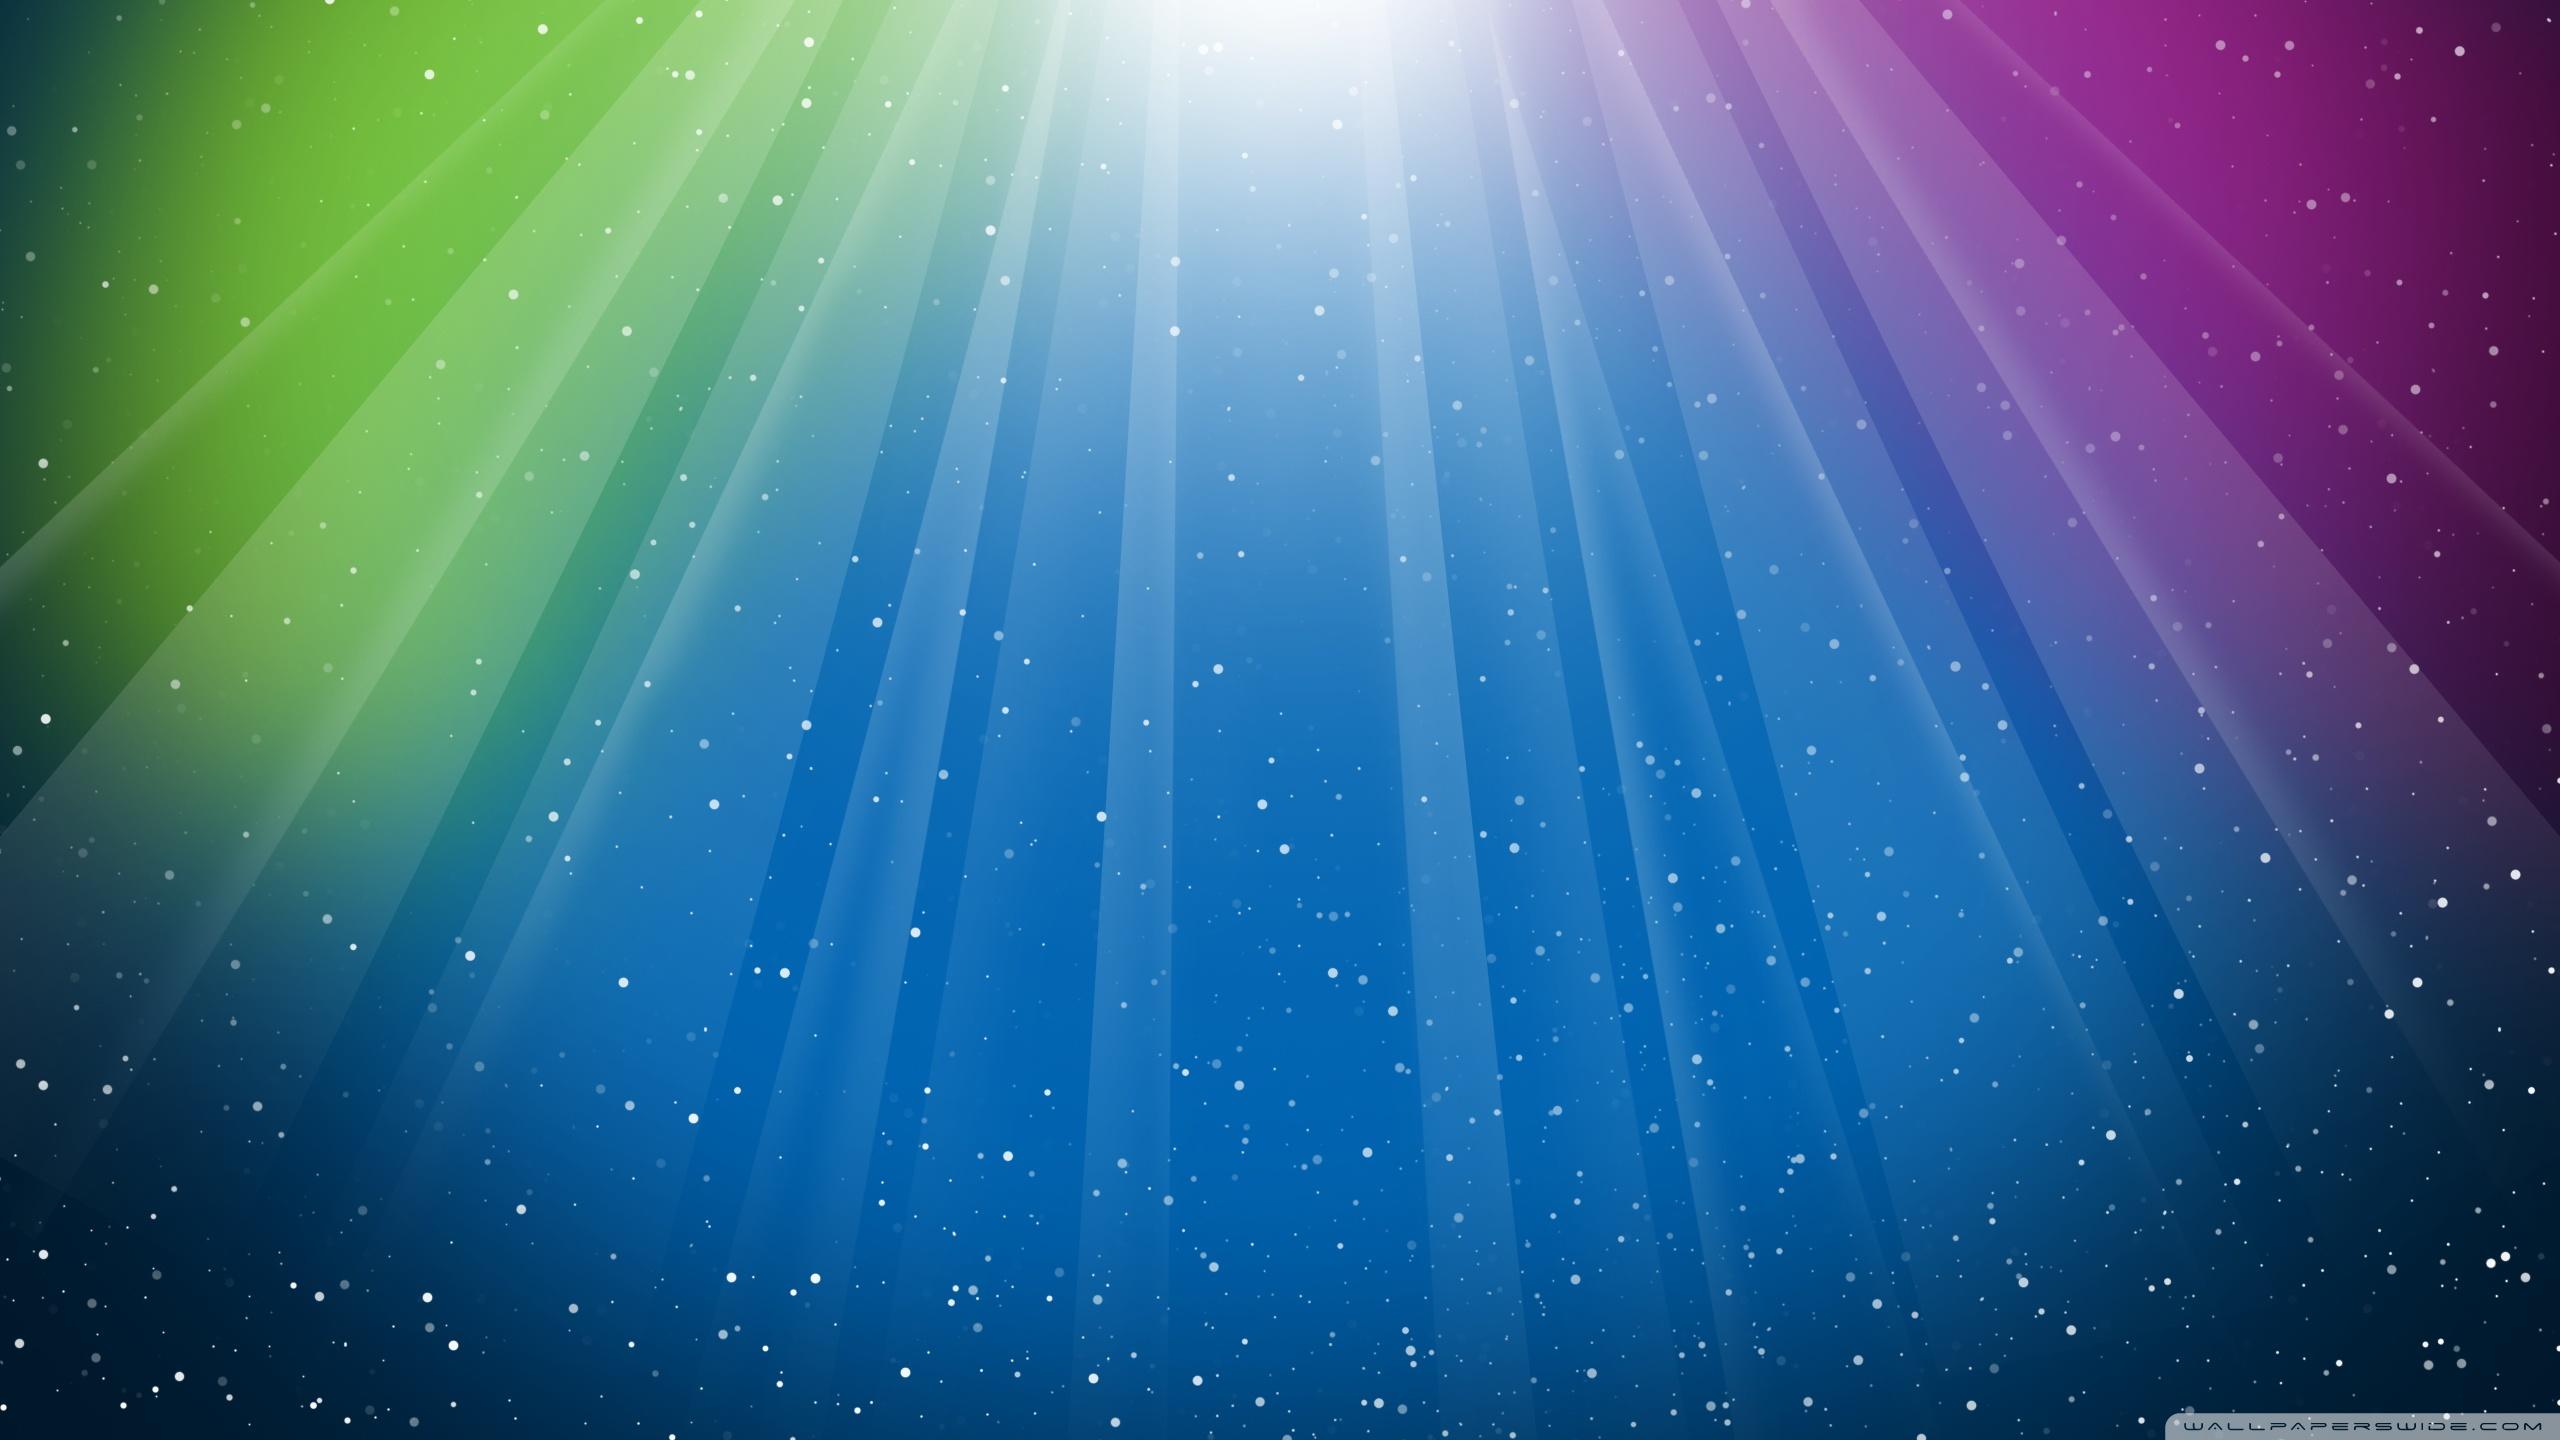 Aurora Burst Blue Green Purple Colorful HD desktop wallpaper